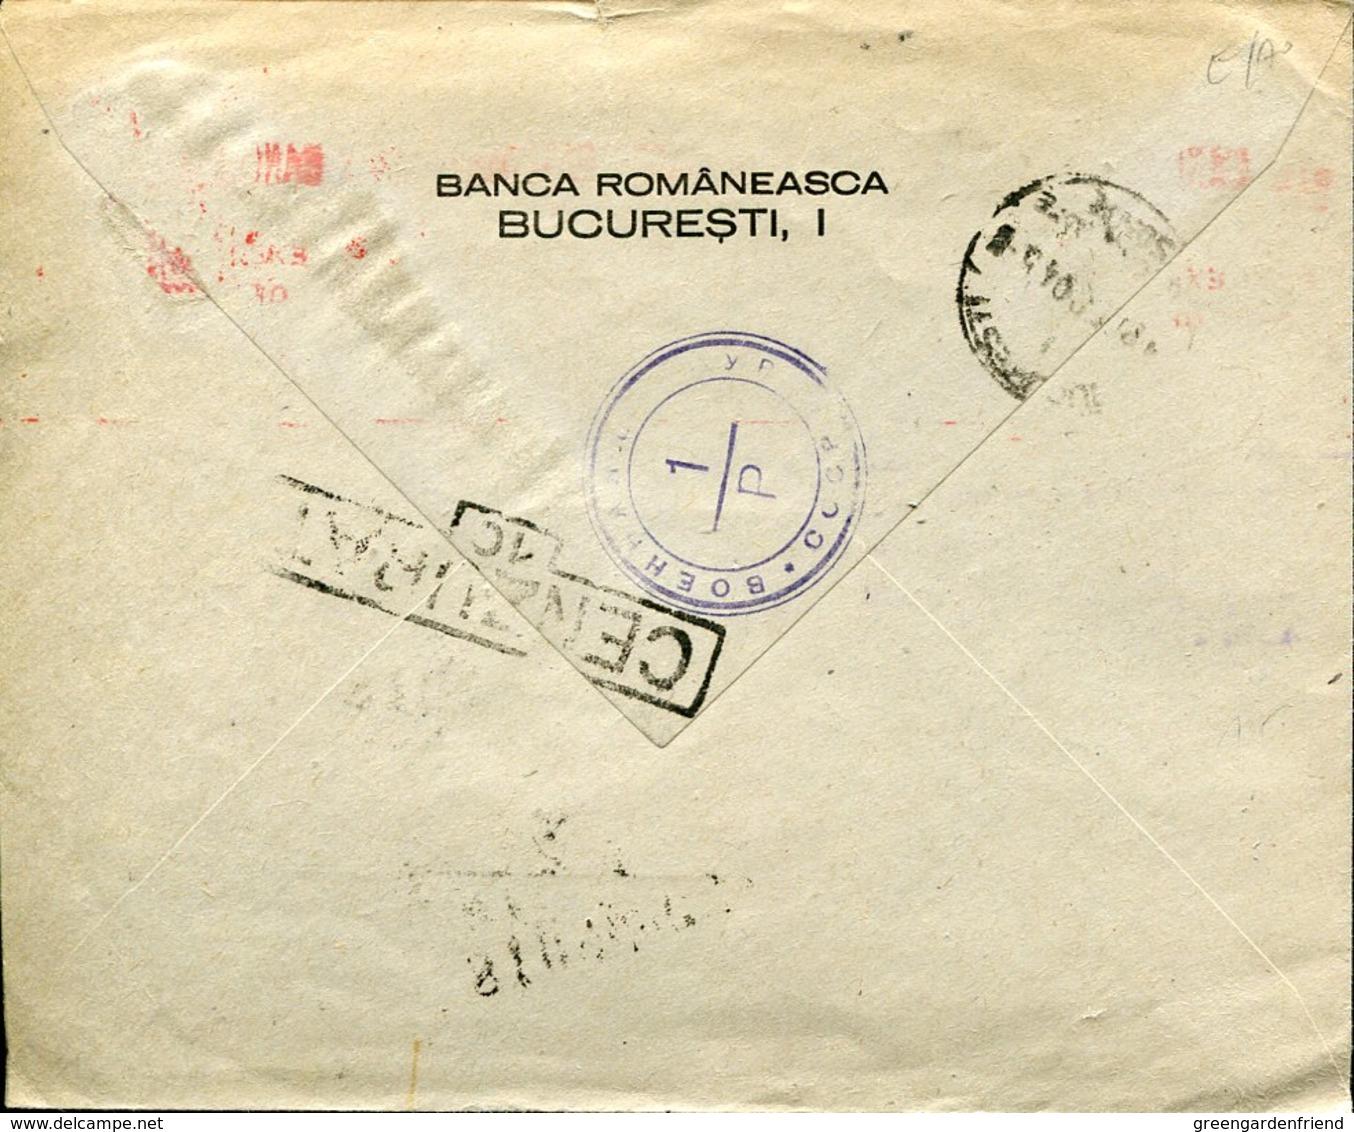 43424 Romania, Circuled Registered Censured Cover 1945 From Bucuresti To Prag, Banca Romaneasca Bucuresti - 2. Weltkrieg (Briefe)